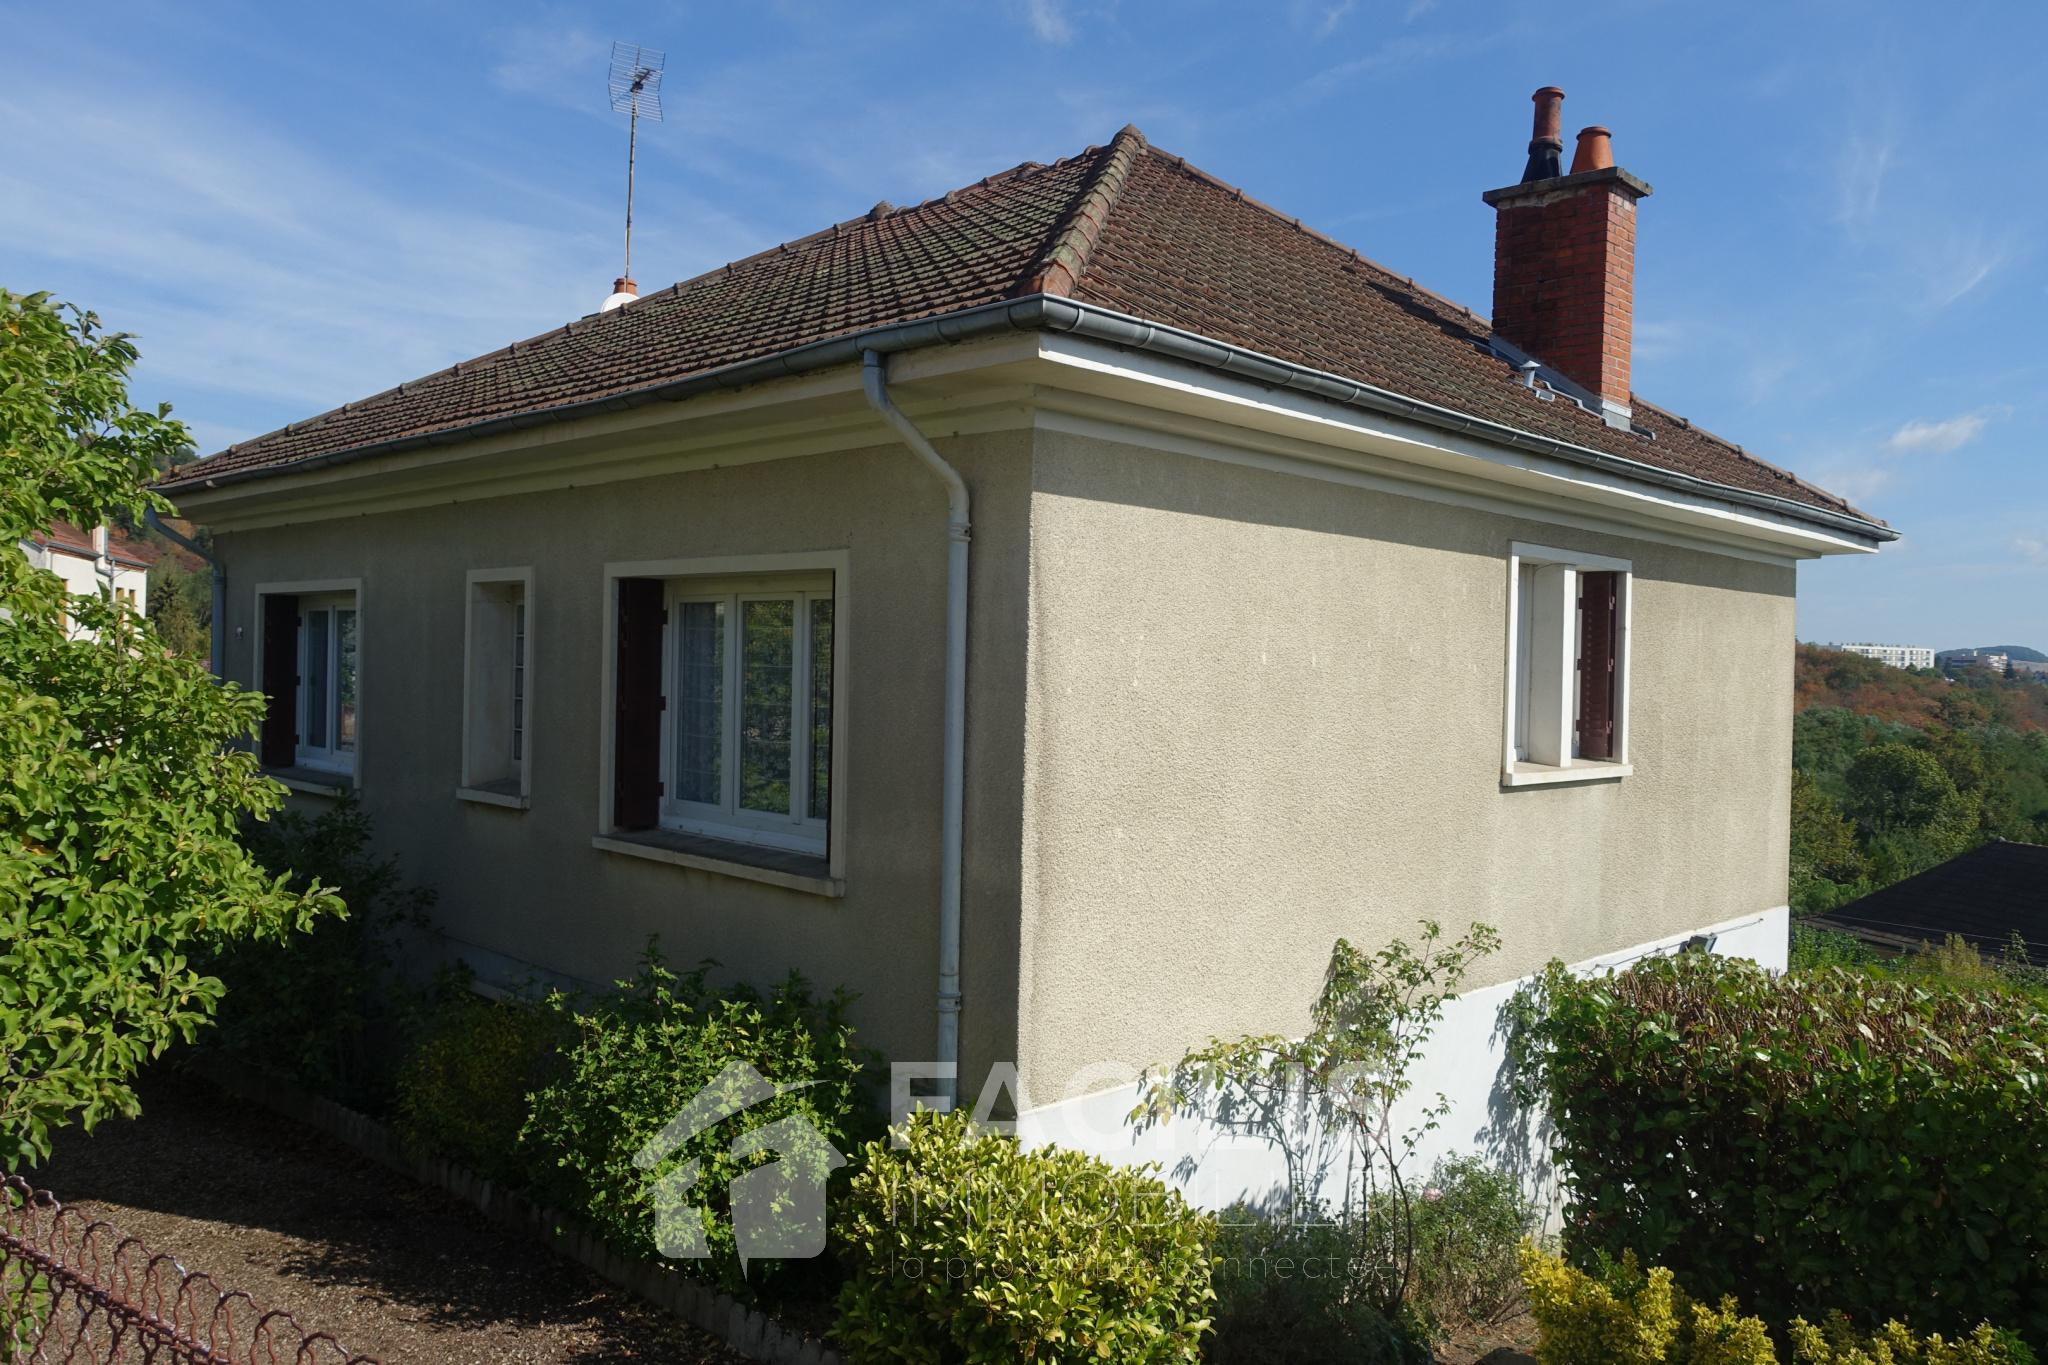 vente maison 2 3 chambres vendre 71200 le creusot. Black Bedroom Furniture Sets. Home Design Ideas